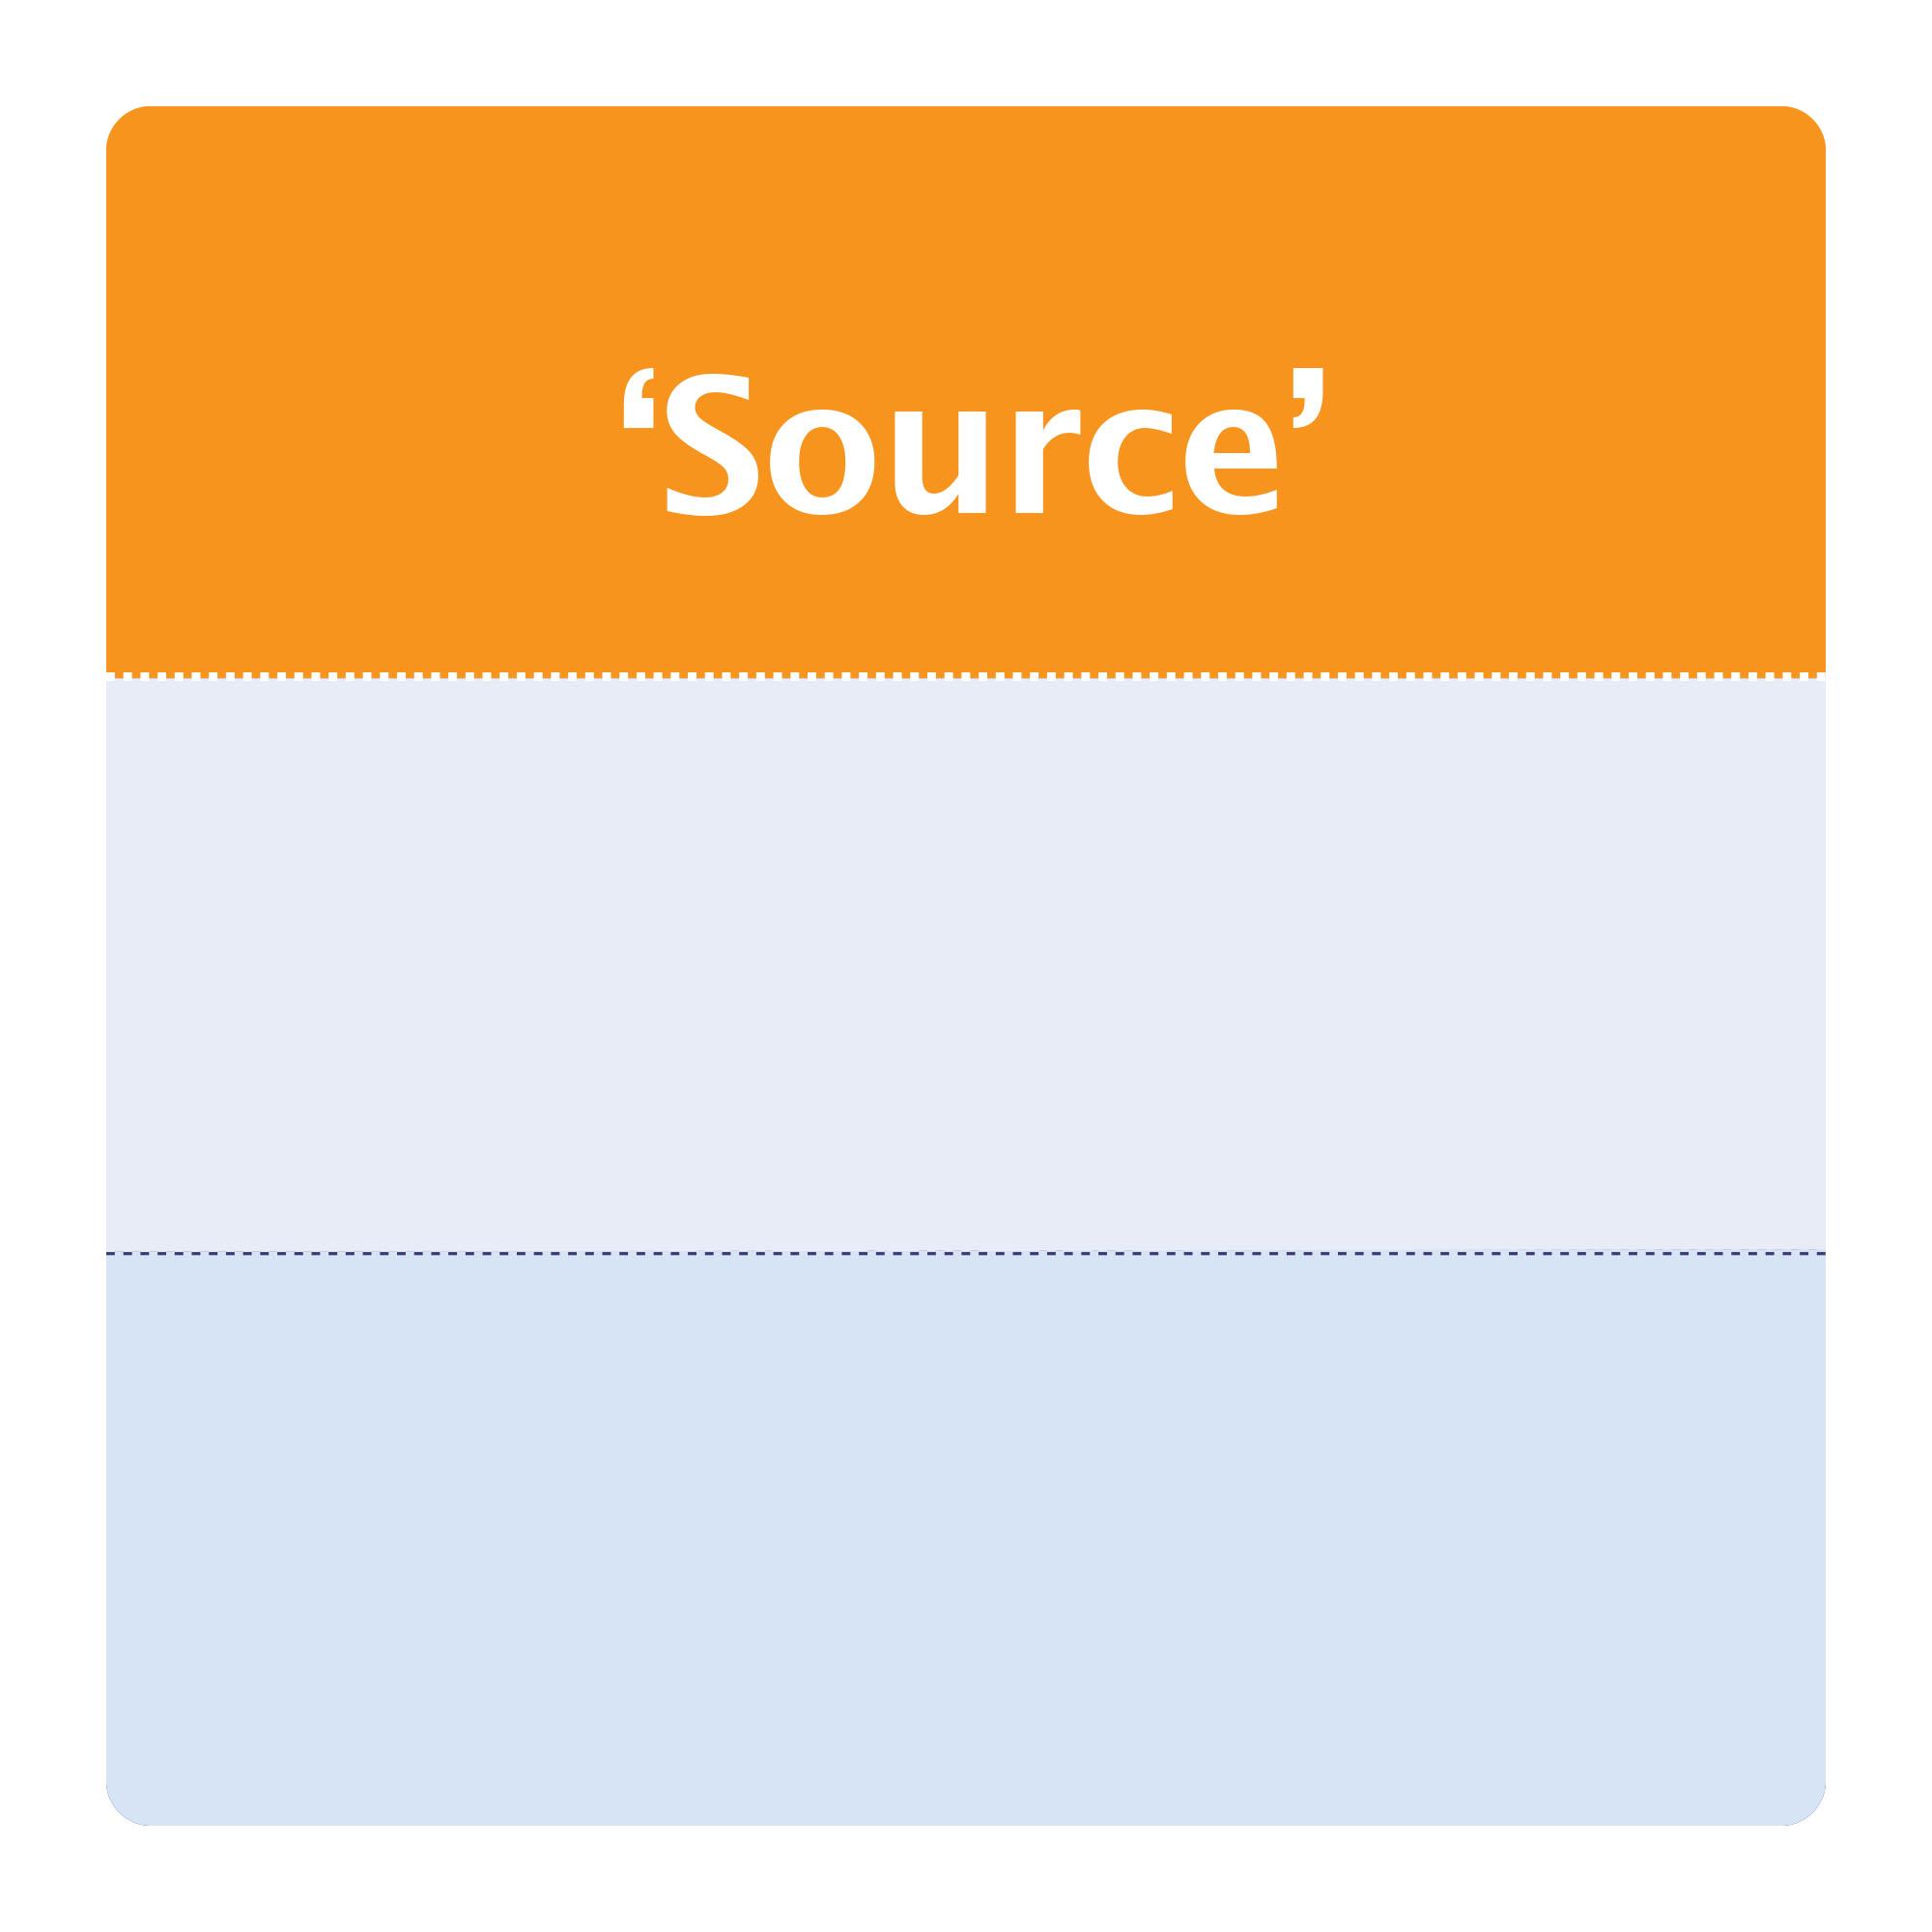 03-Source